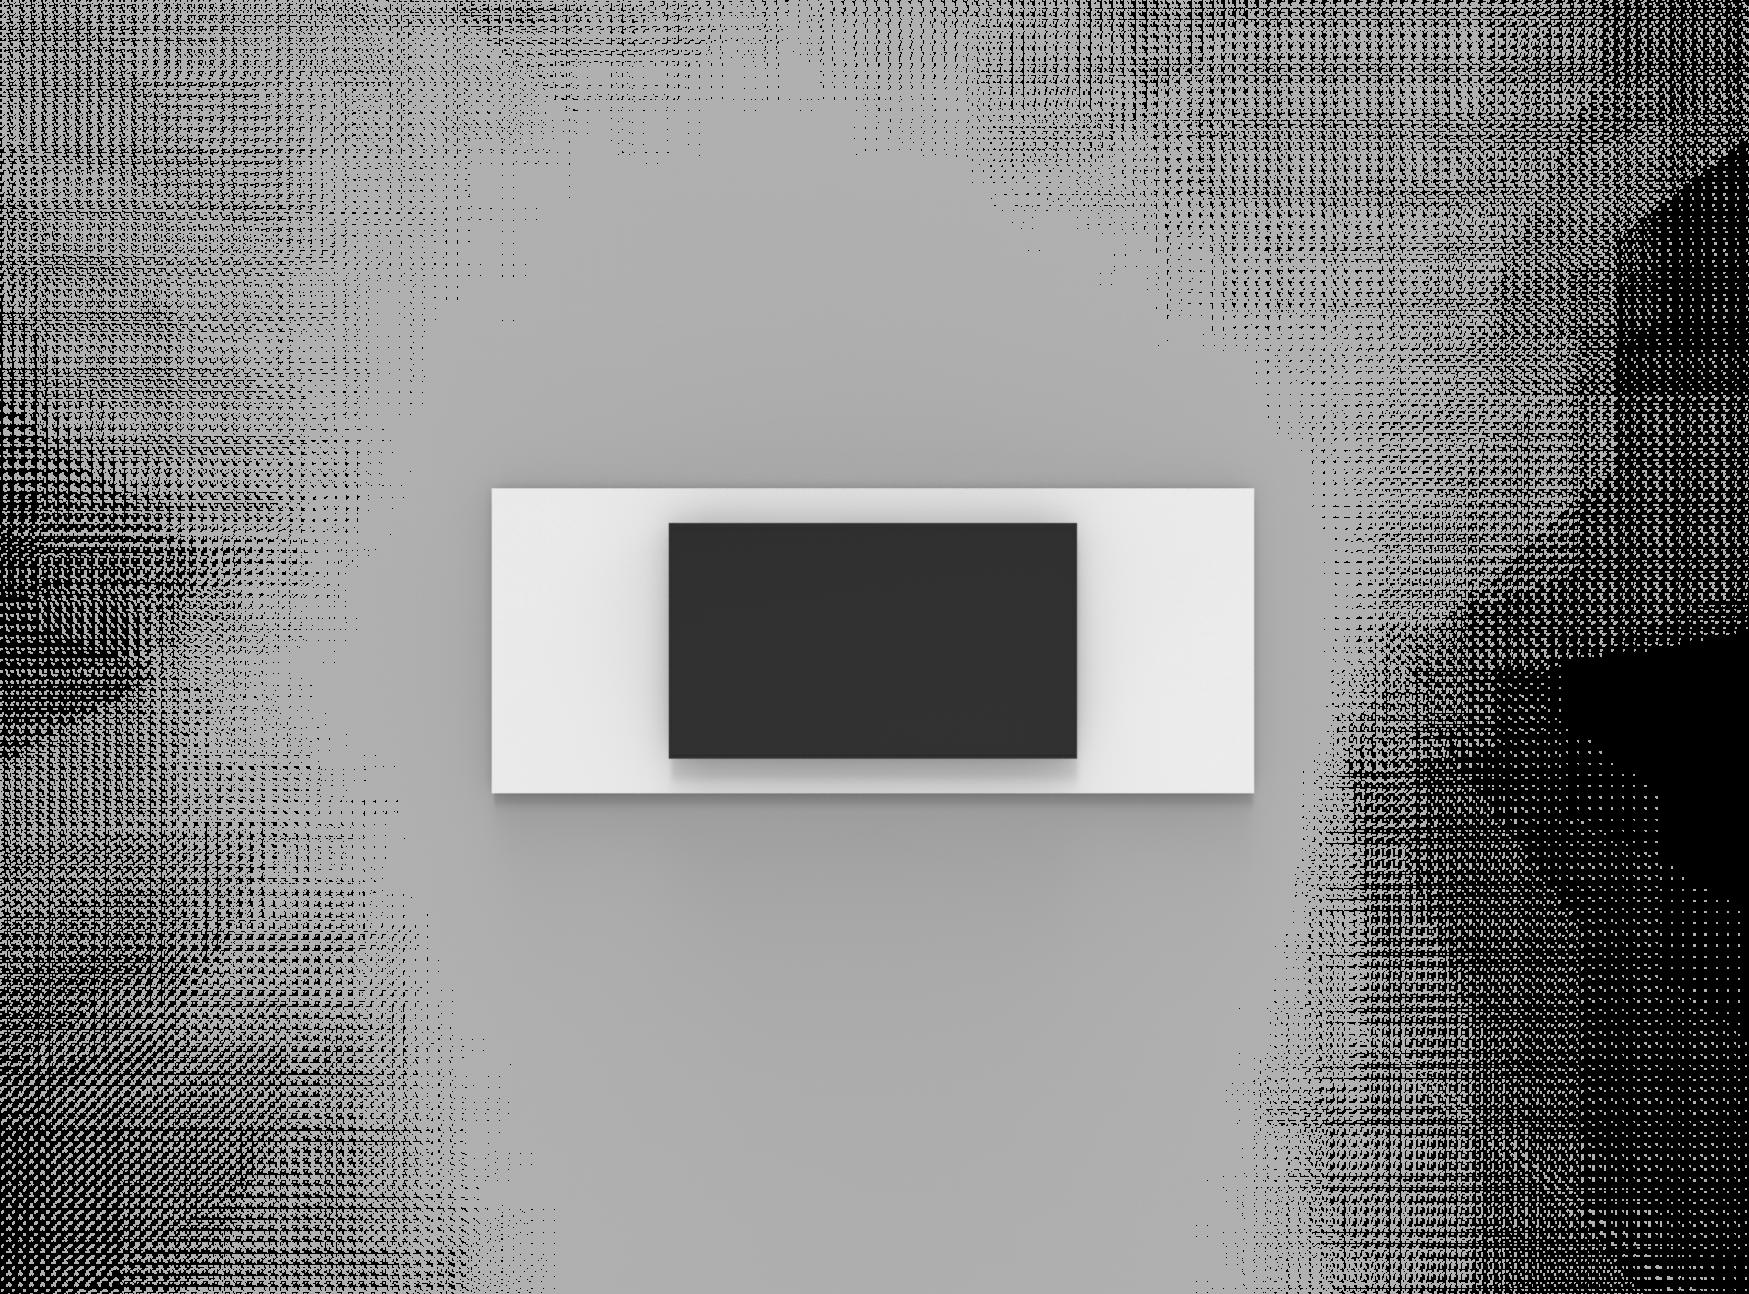 2990 x 1190